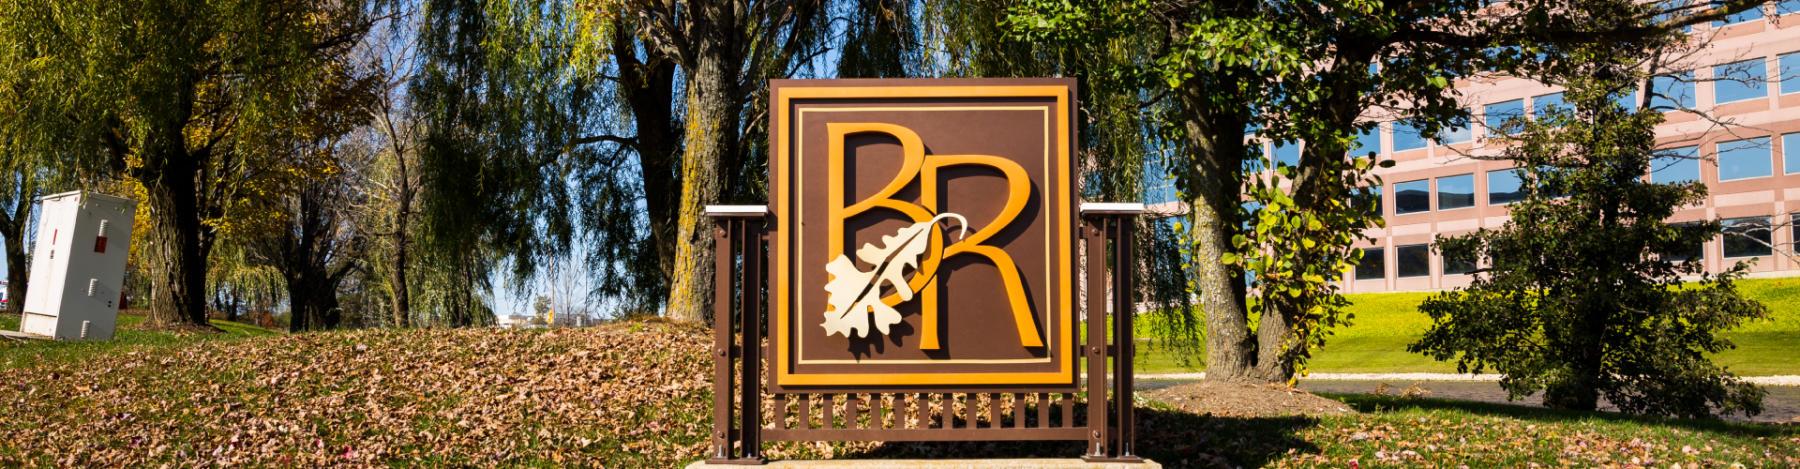 Experience the Village of Burr Ridge